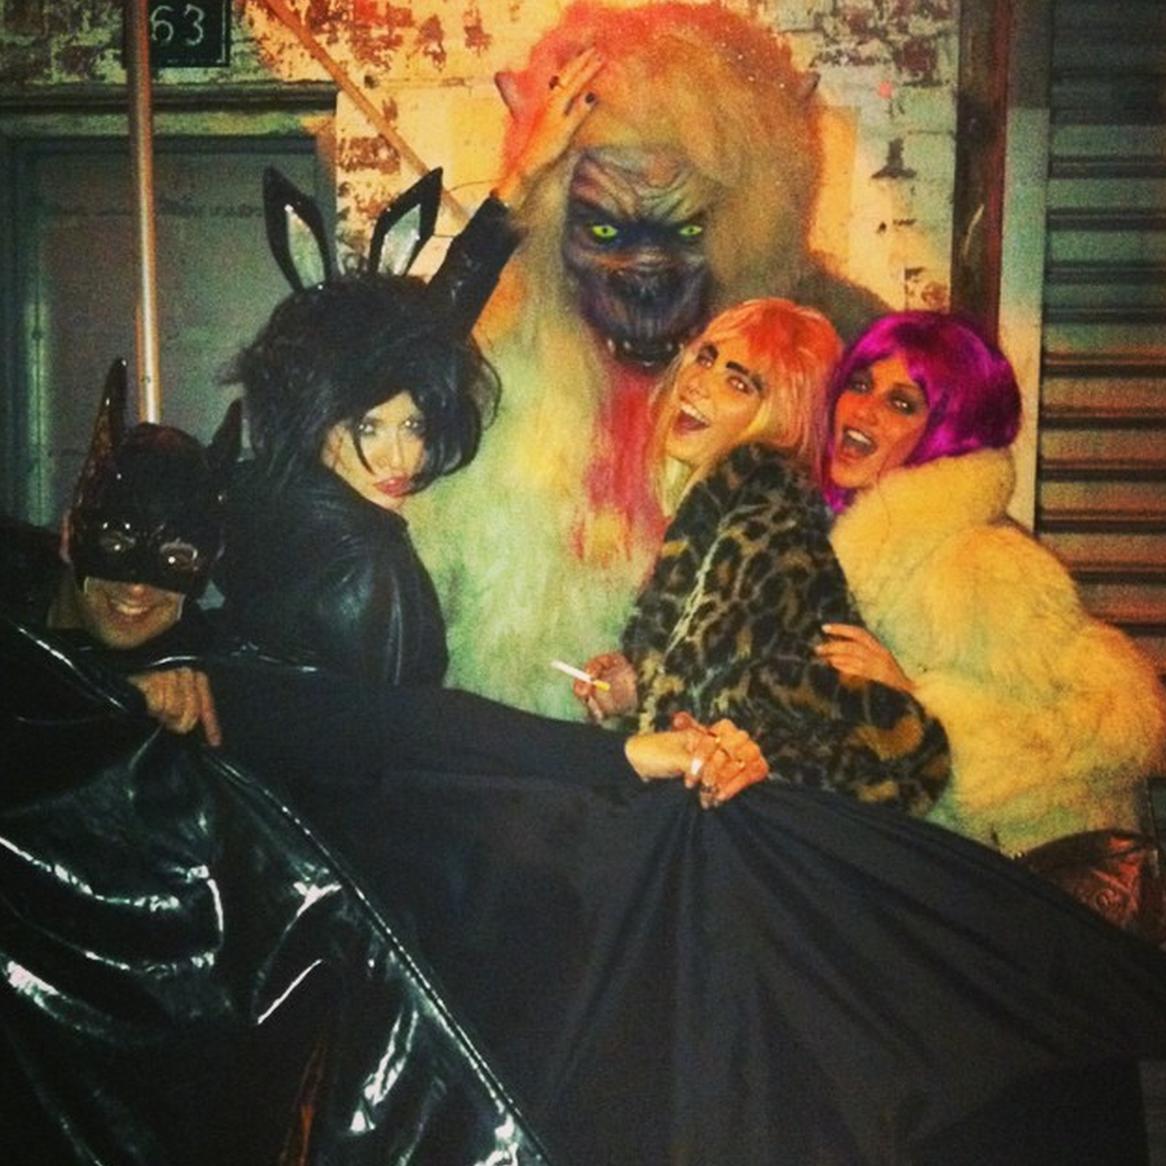 #TBT best helloween ever! NYC-2011 @helder_marques @adricaye @alineweber_real #queriaestarla #chatiada